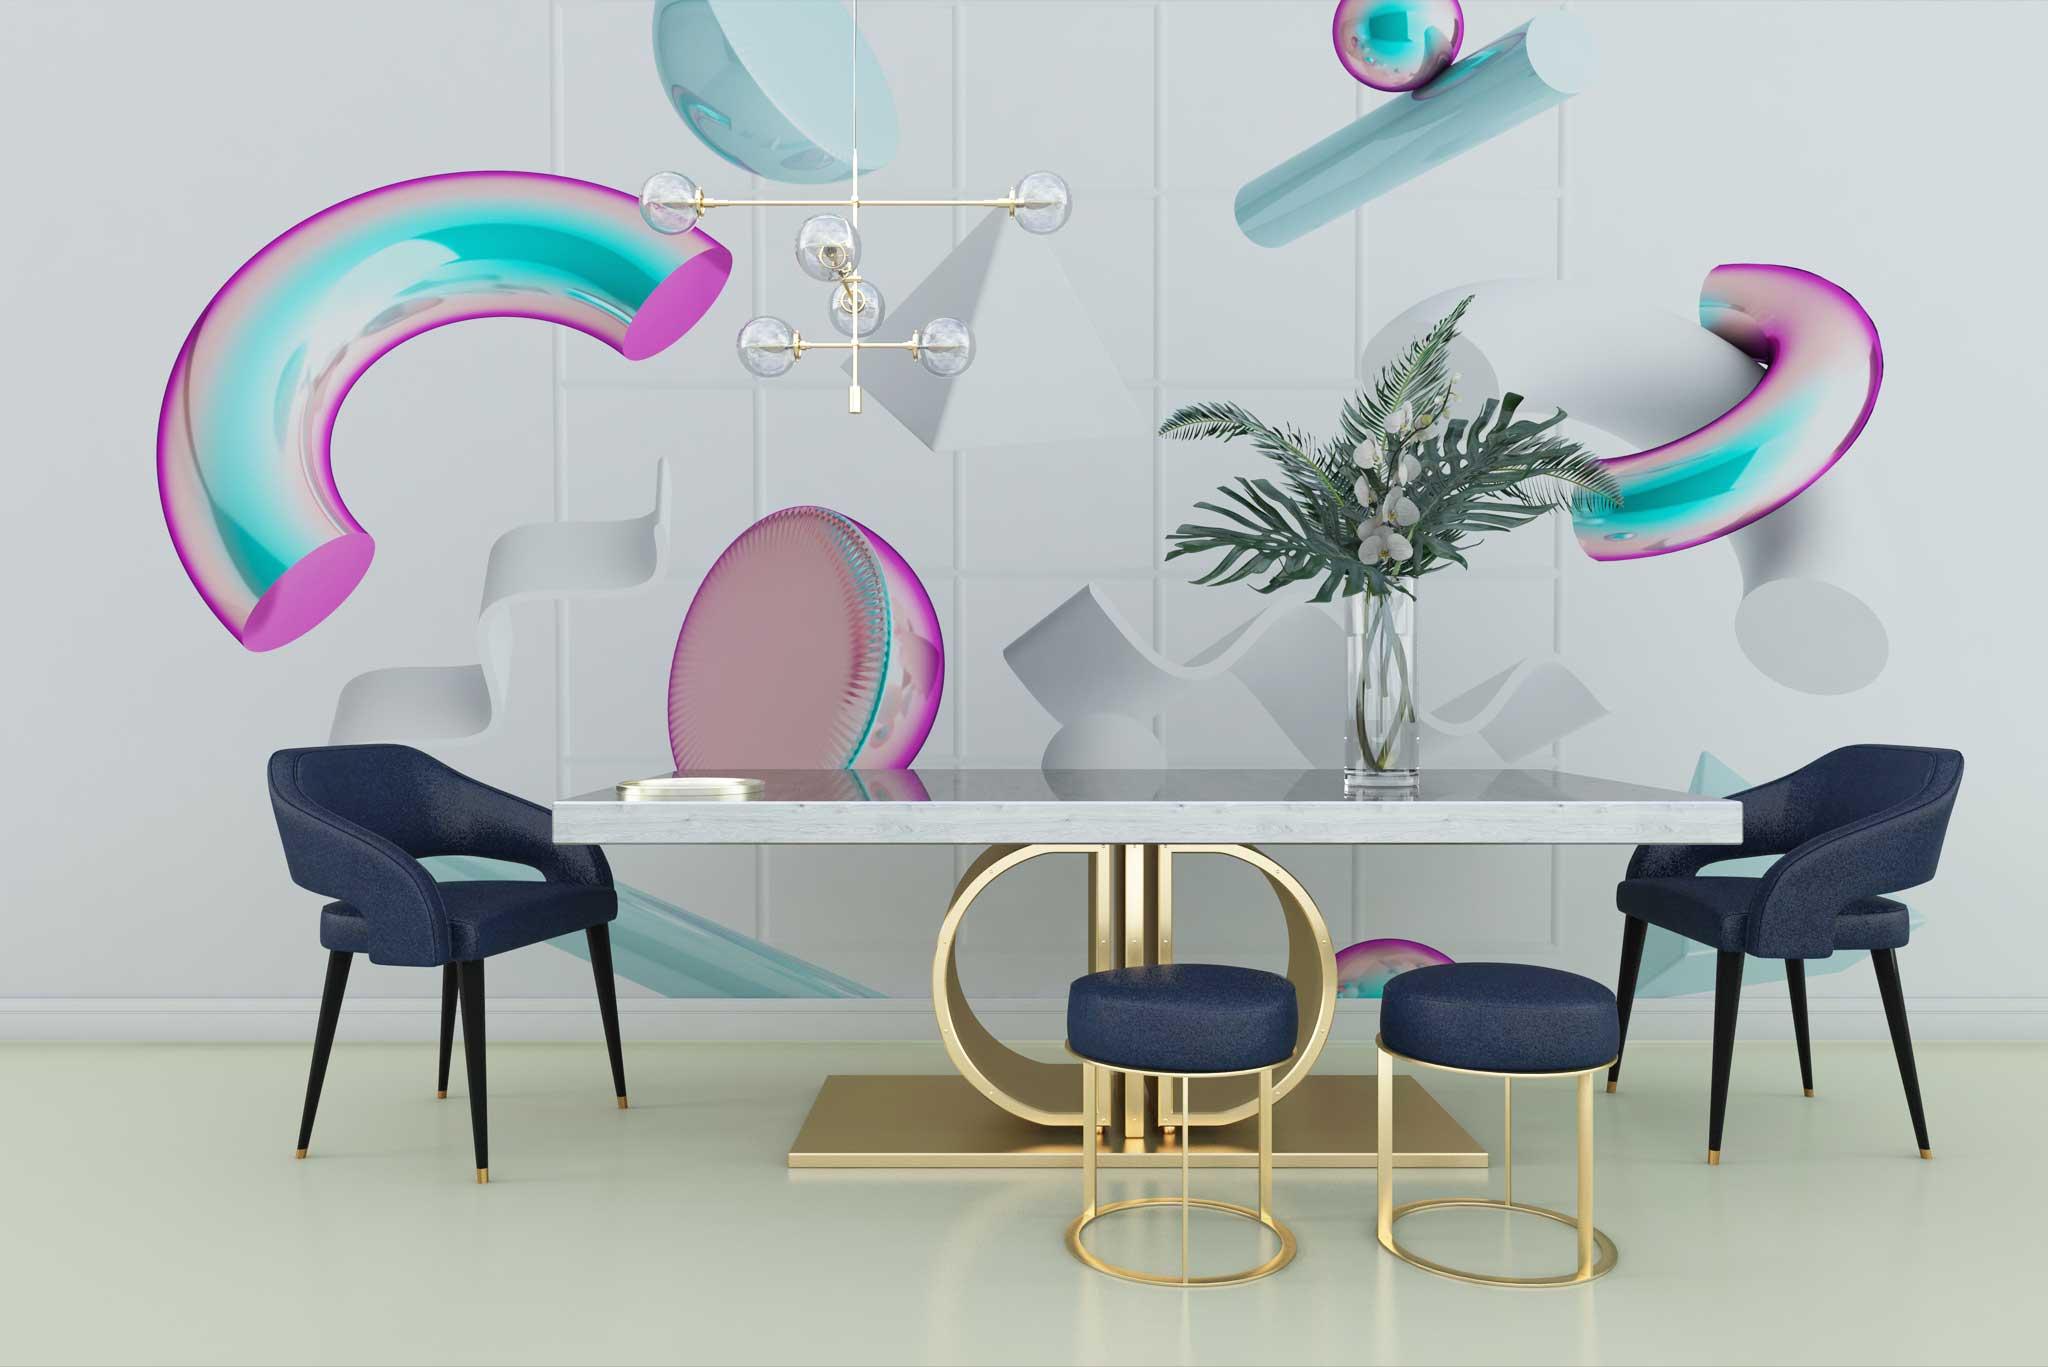 tapet-fototapet-personalizat-comanda-bucuresti-model-abstract-volume-alb-roz-perete-lux-special